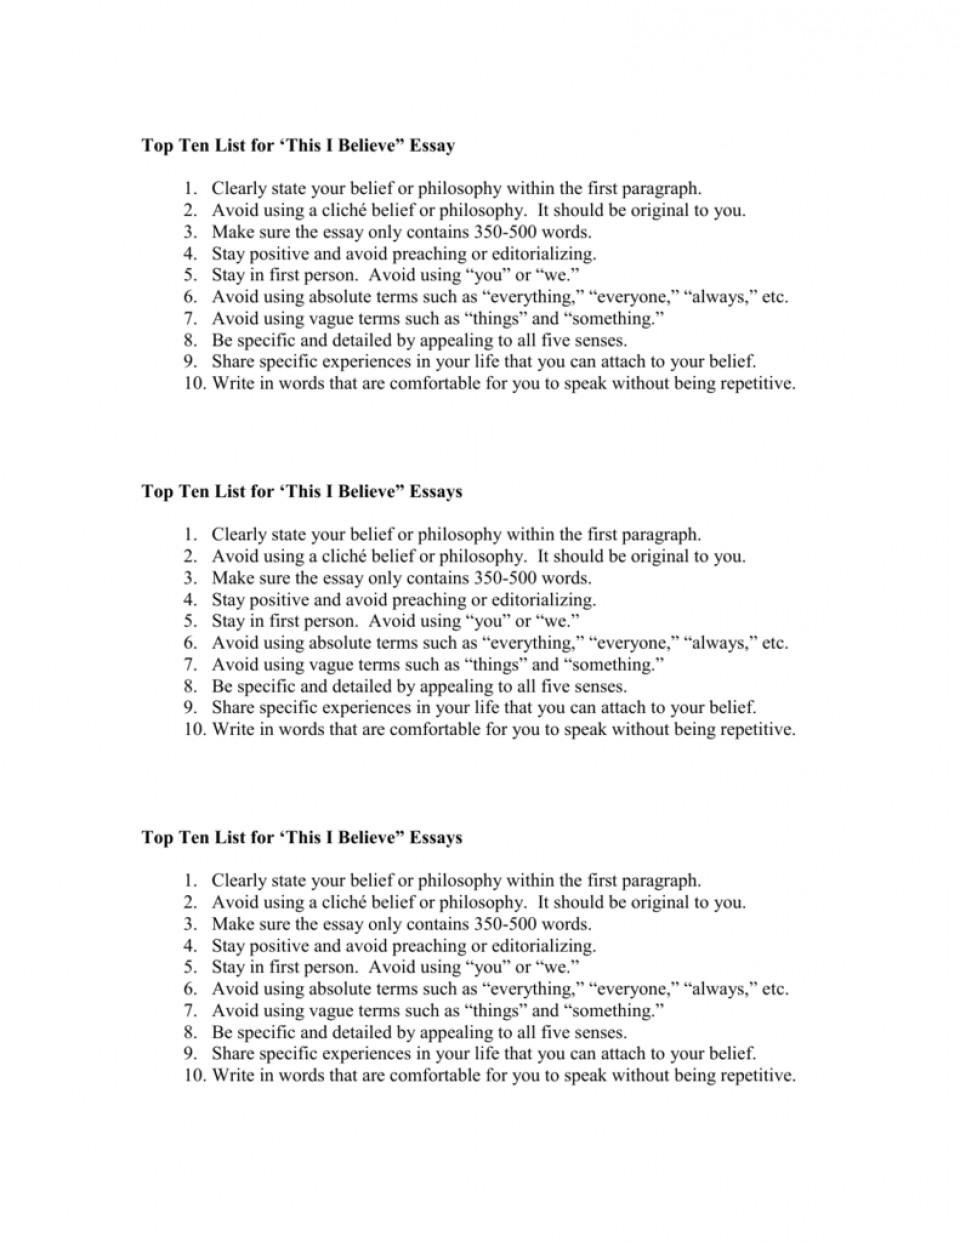 008 I Belive Essays 007293020 1 Essay Surprising Believe About Sports Ideas 960